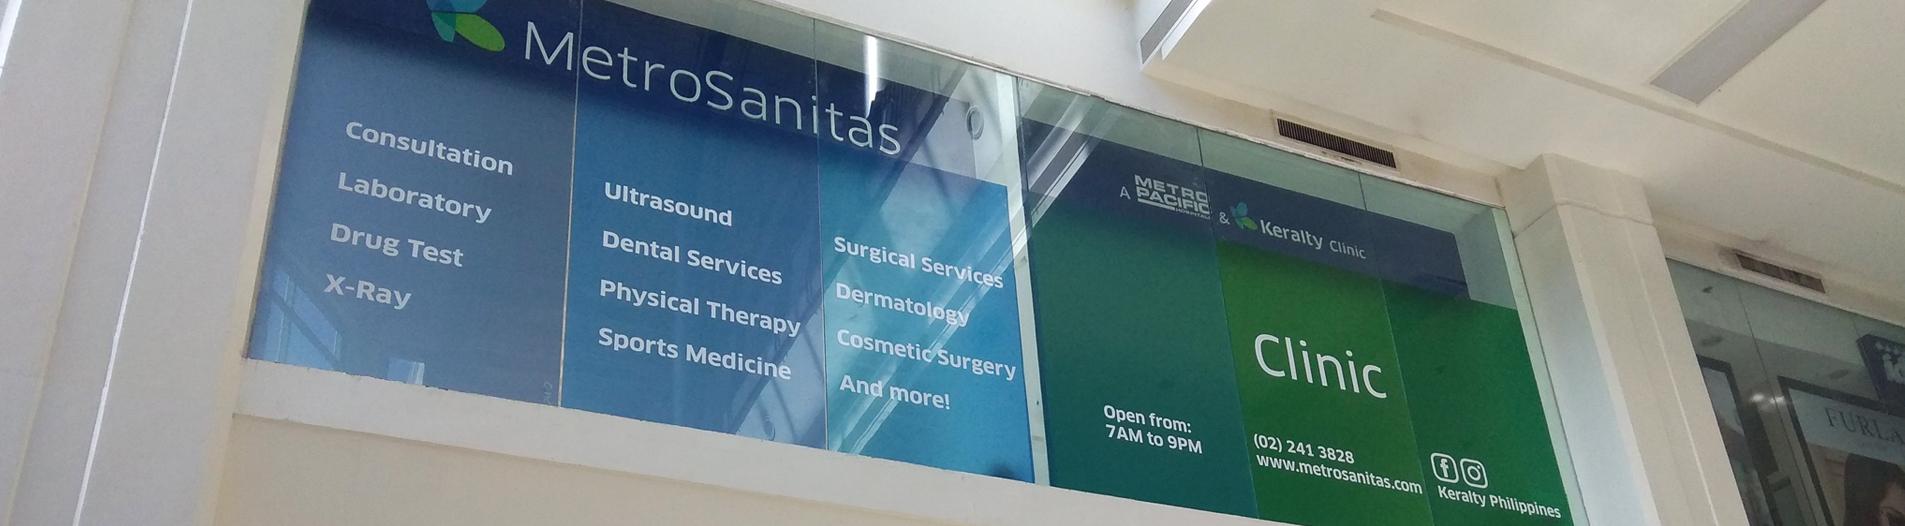 MetroSanitas Clinics